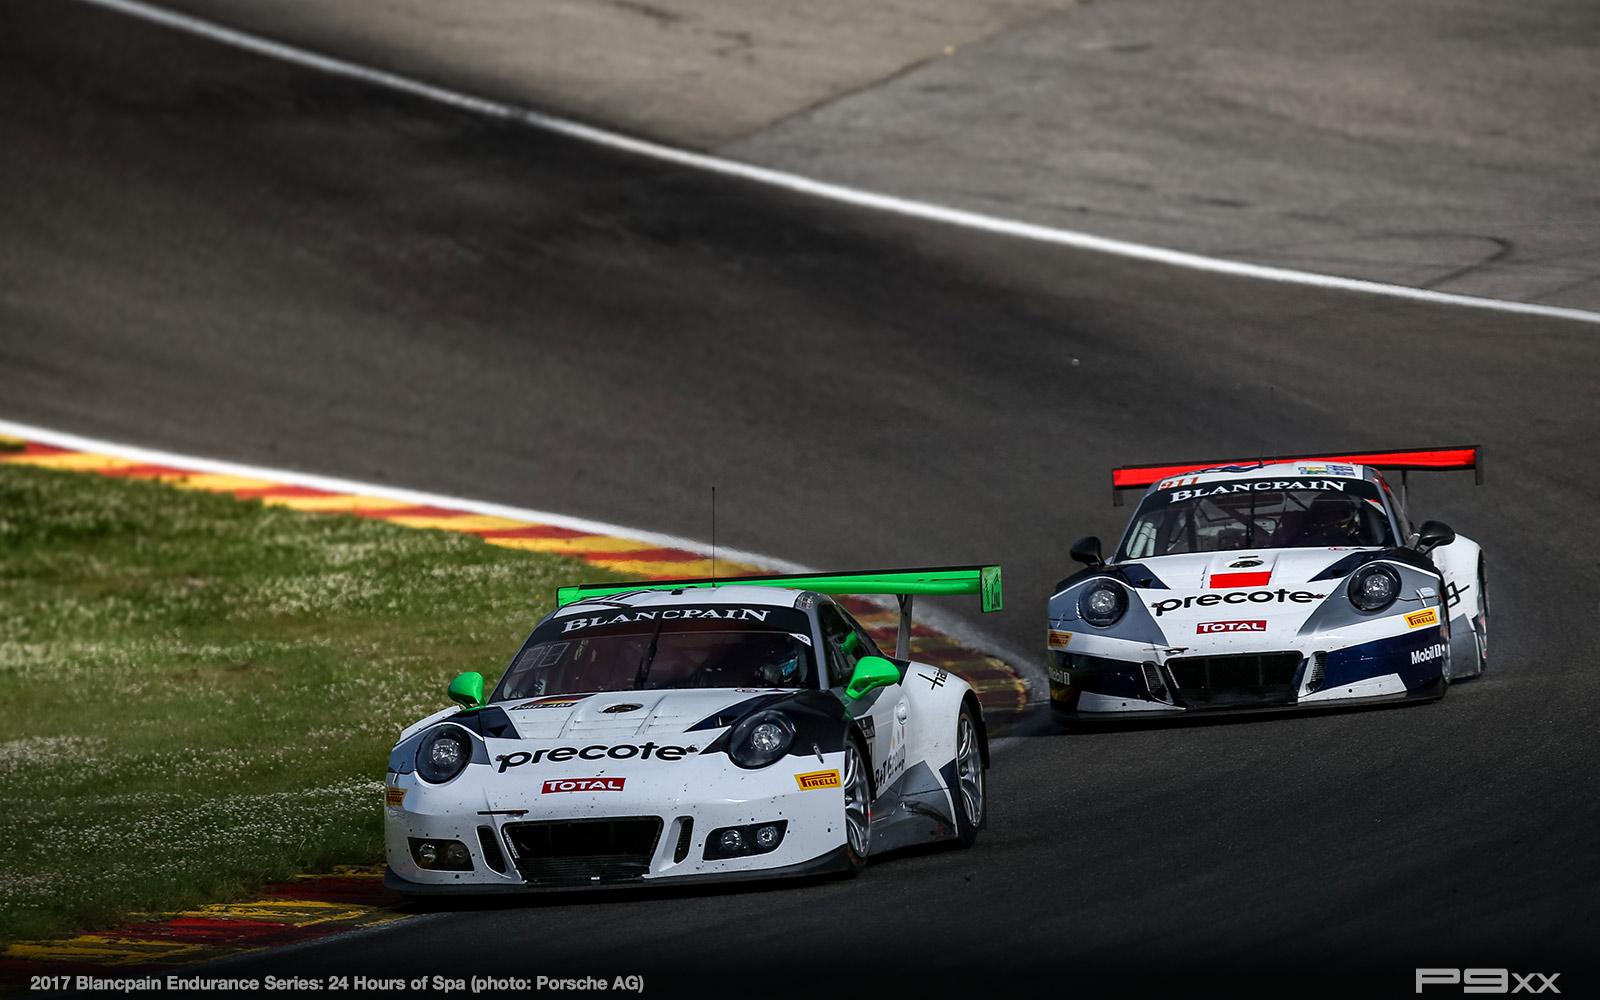 2017-24-Hours-of-Spa-Porsche-284